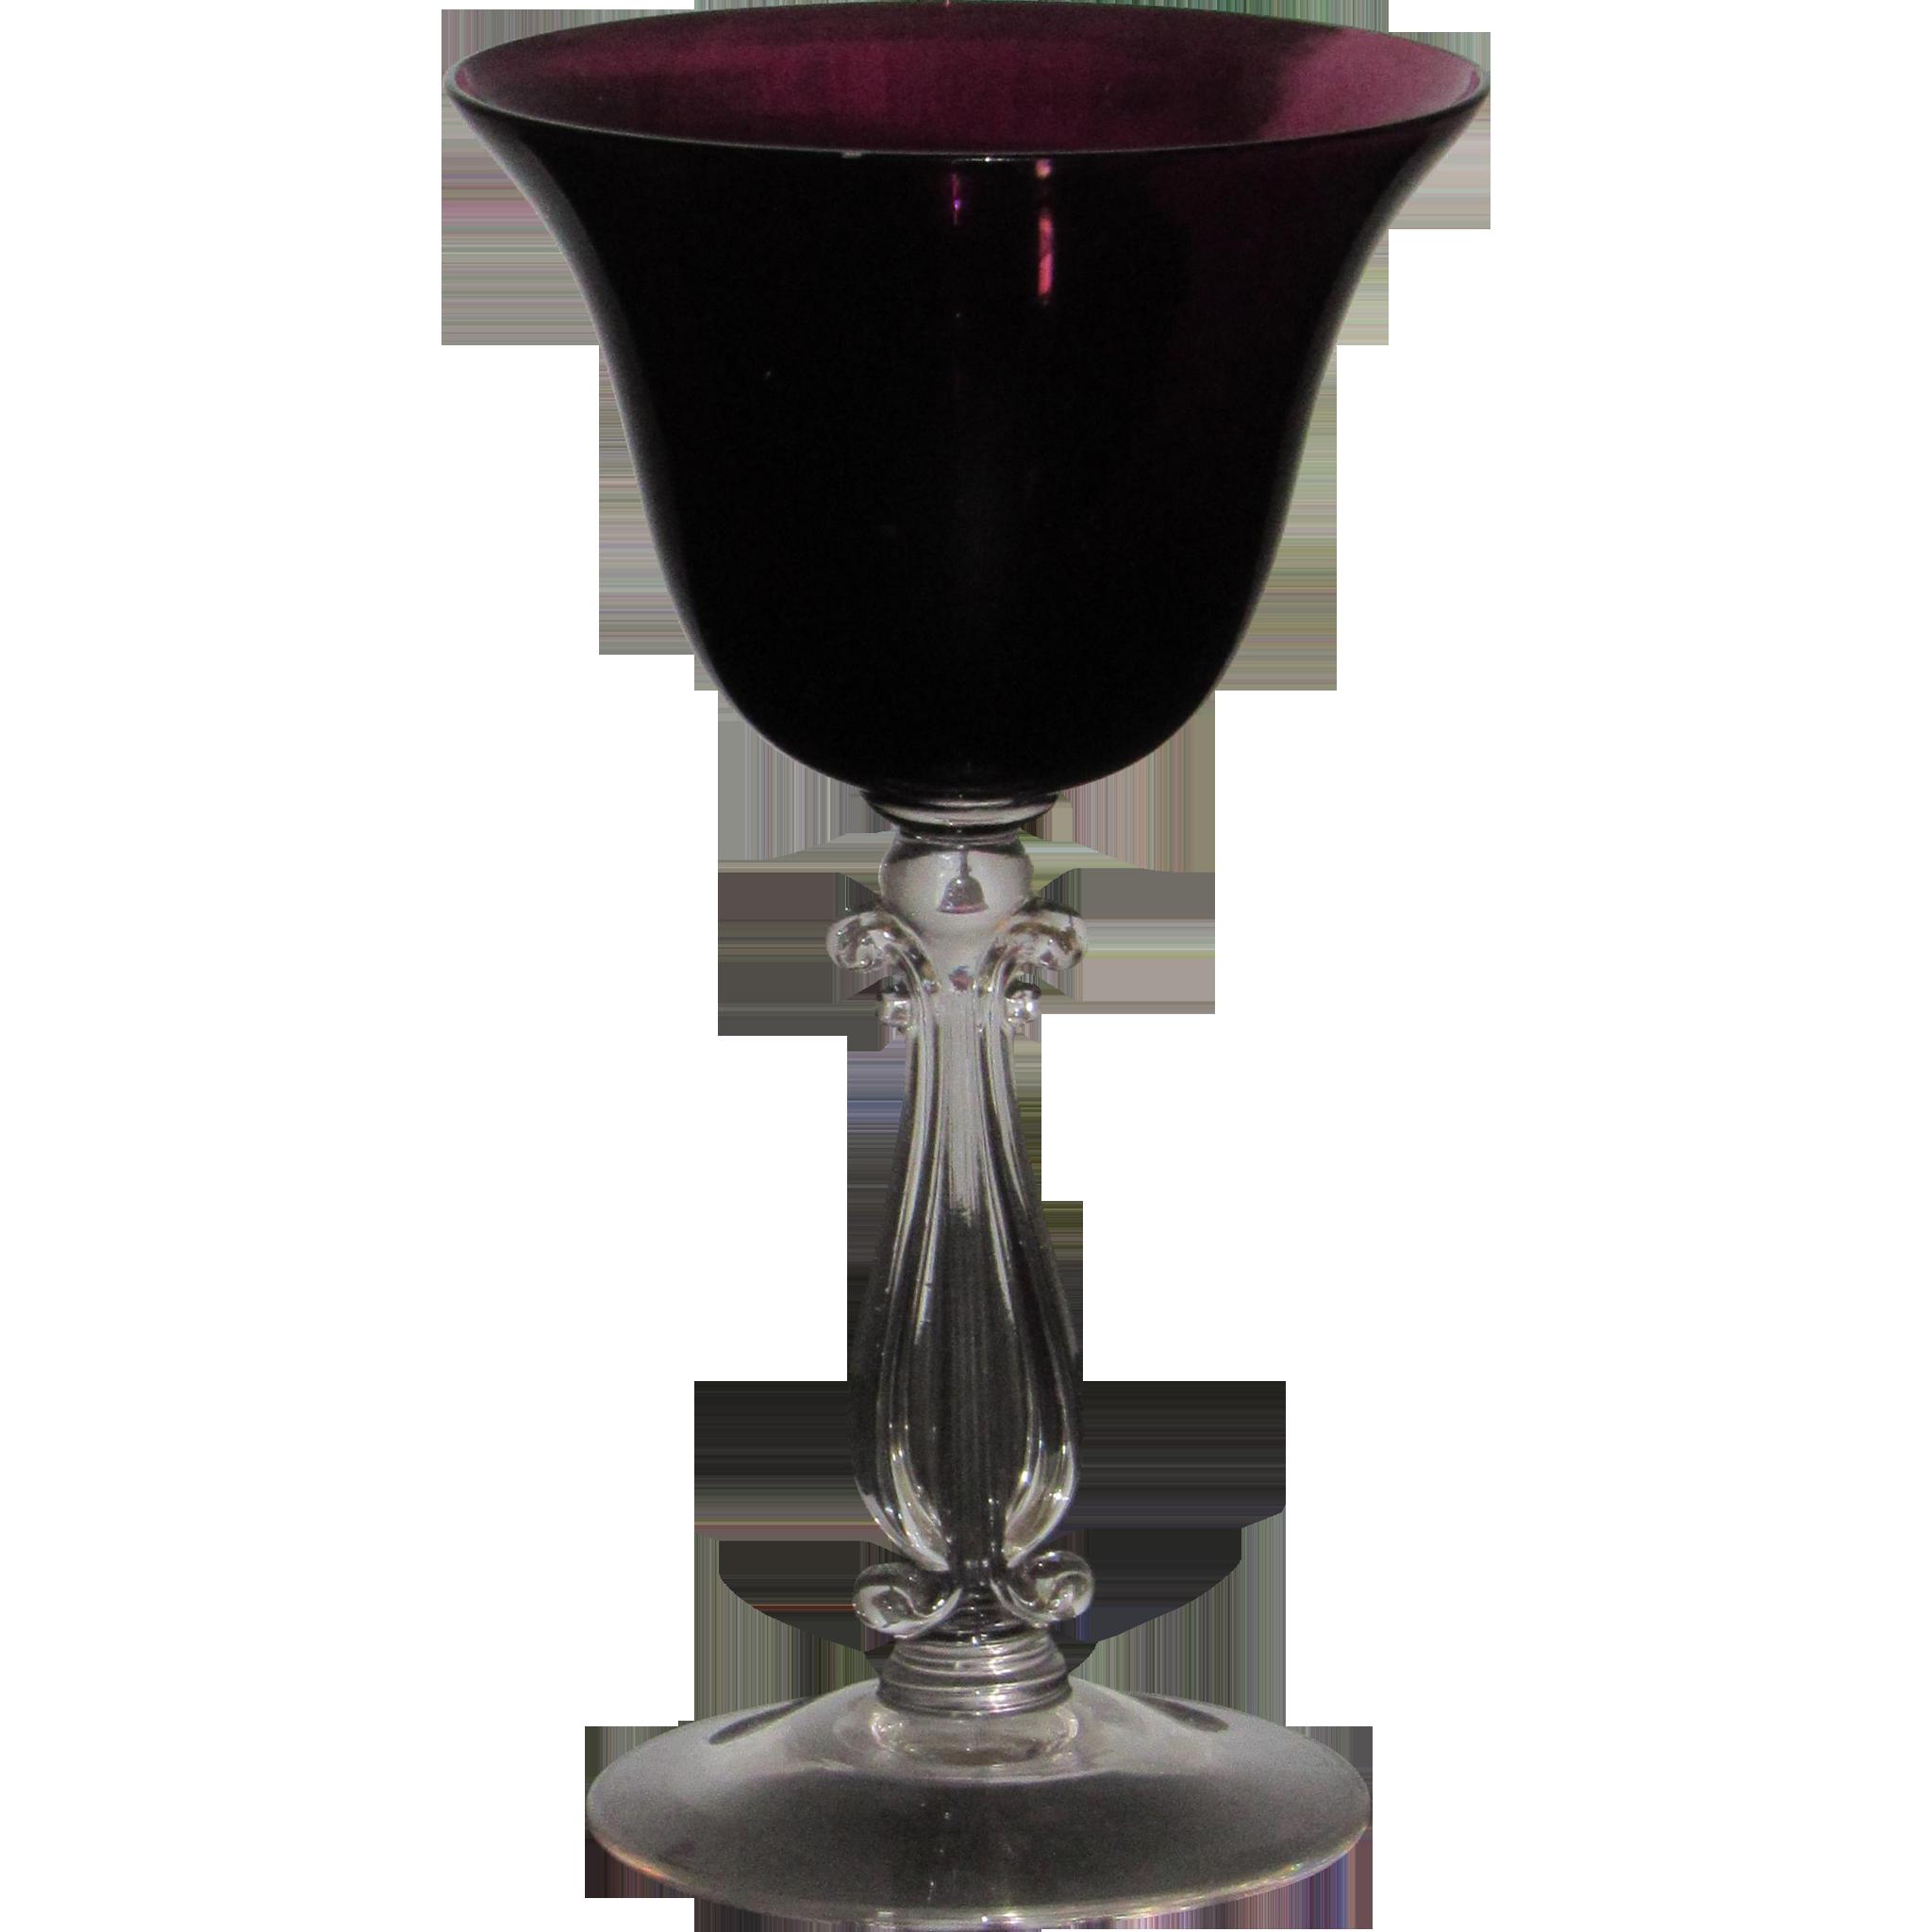 Cambridge Stradivari Cocktail Glass in Amethyst